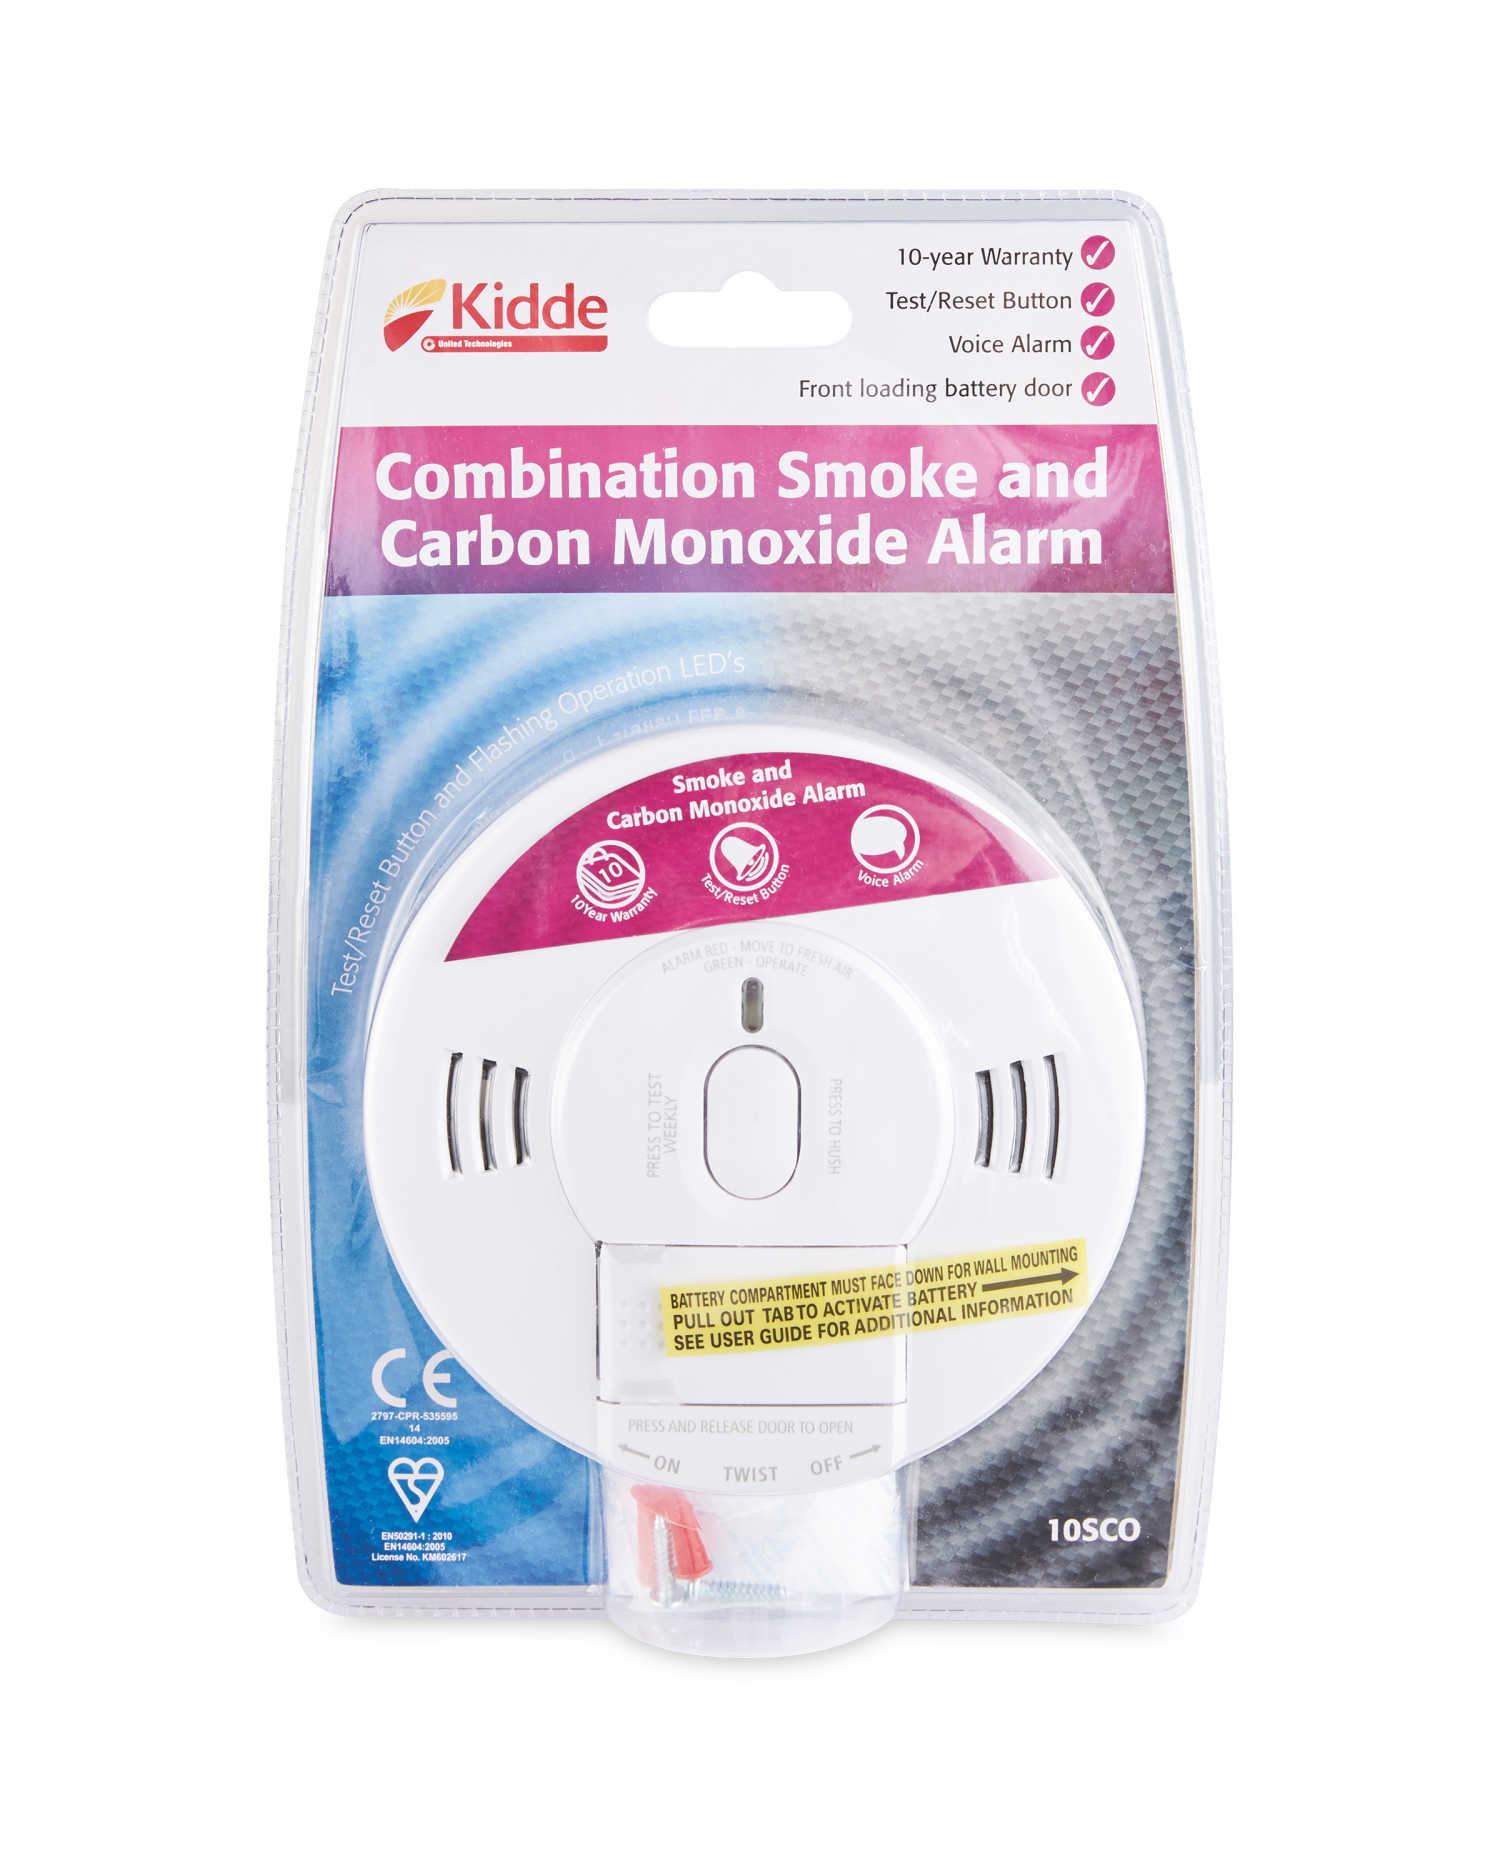 Kidde 2-in-1 Smoke & Carbon Monoxide Alarm - £15.99 @ Aldi